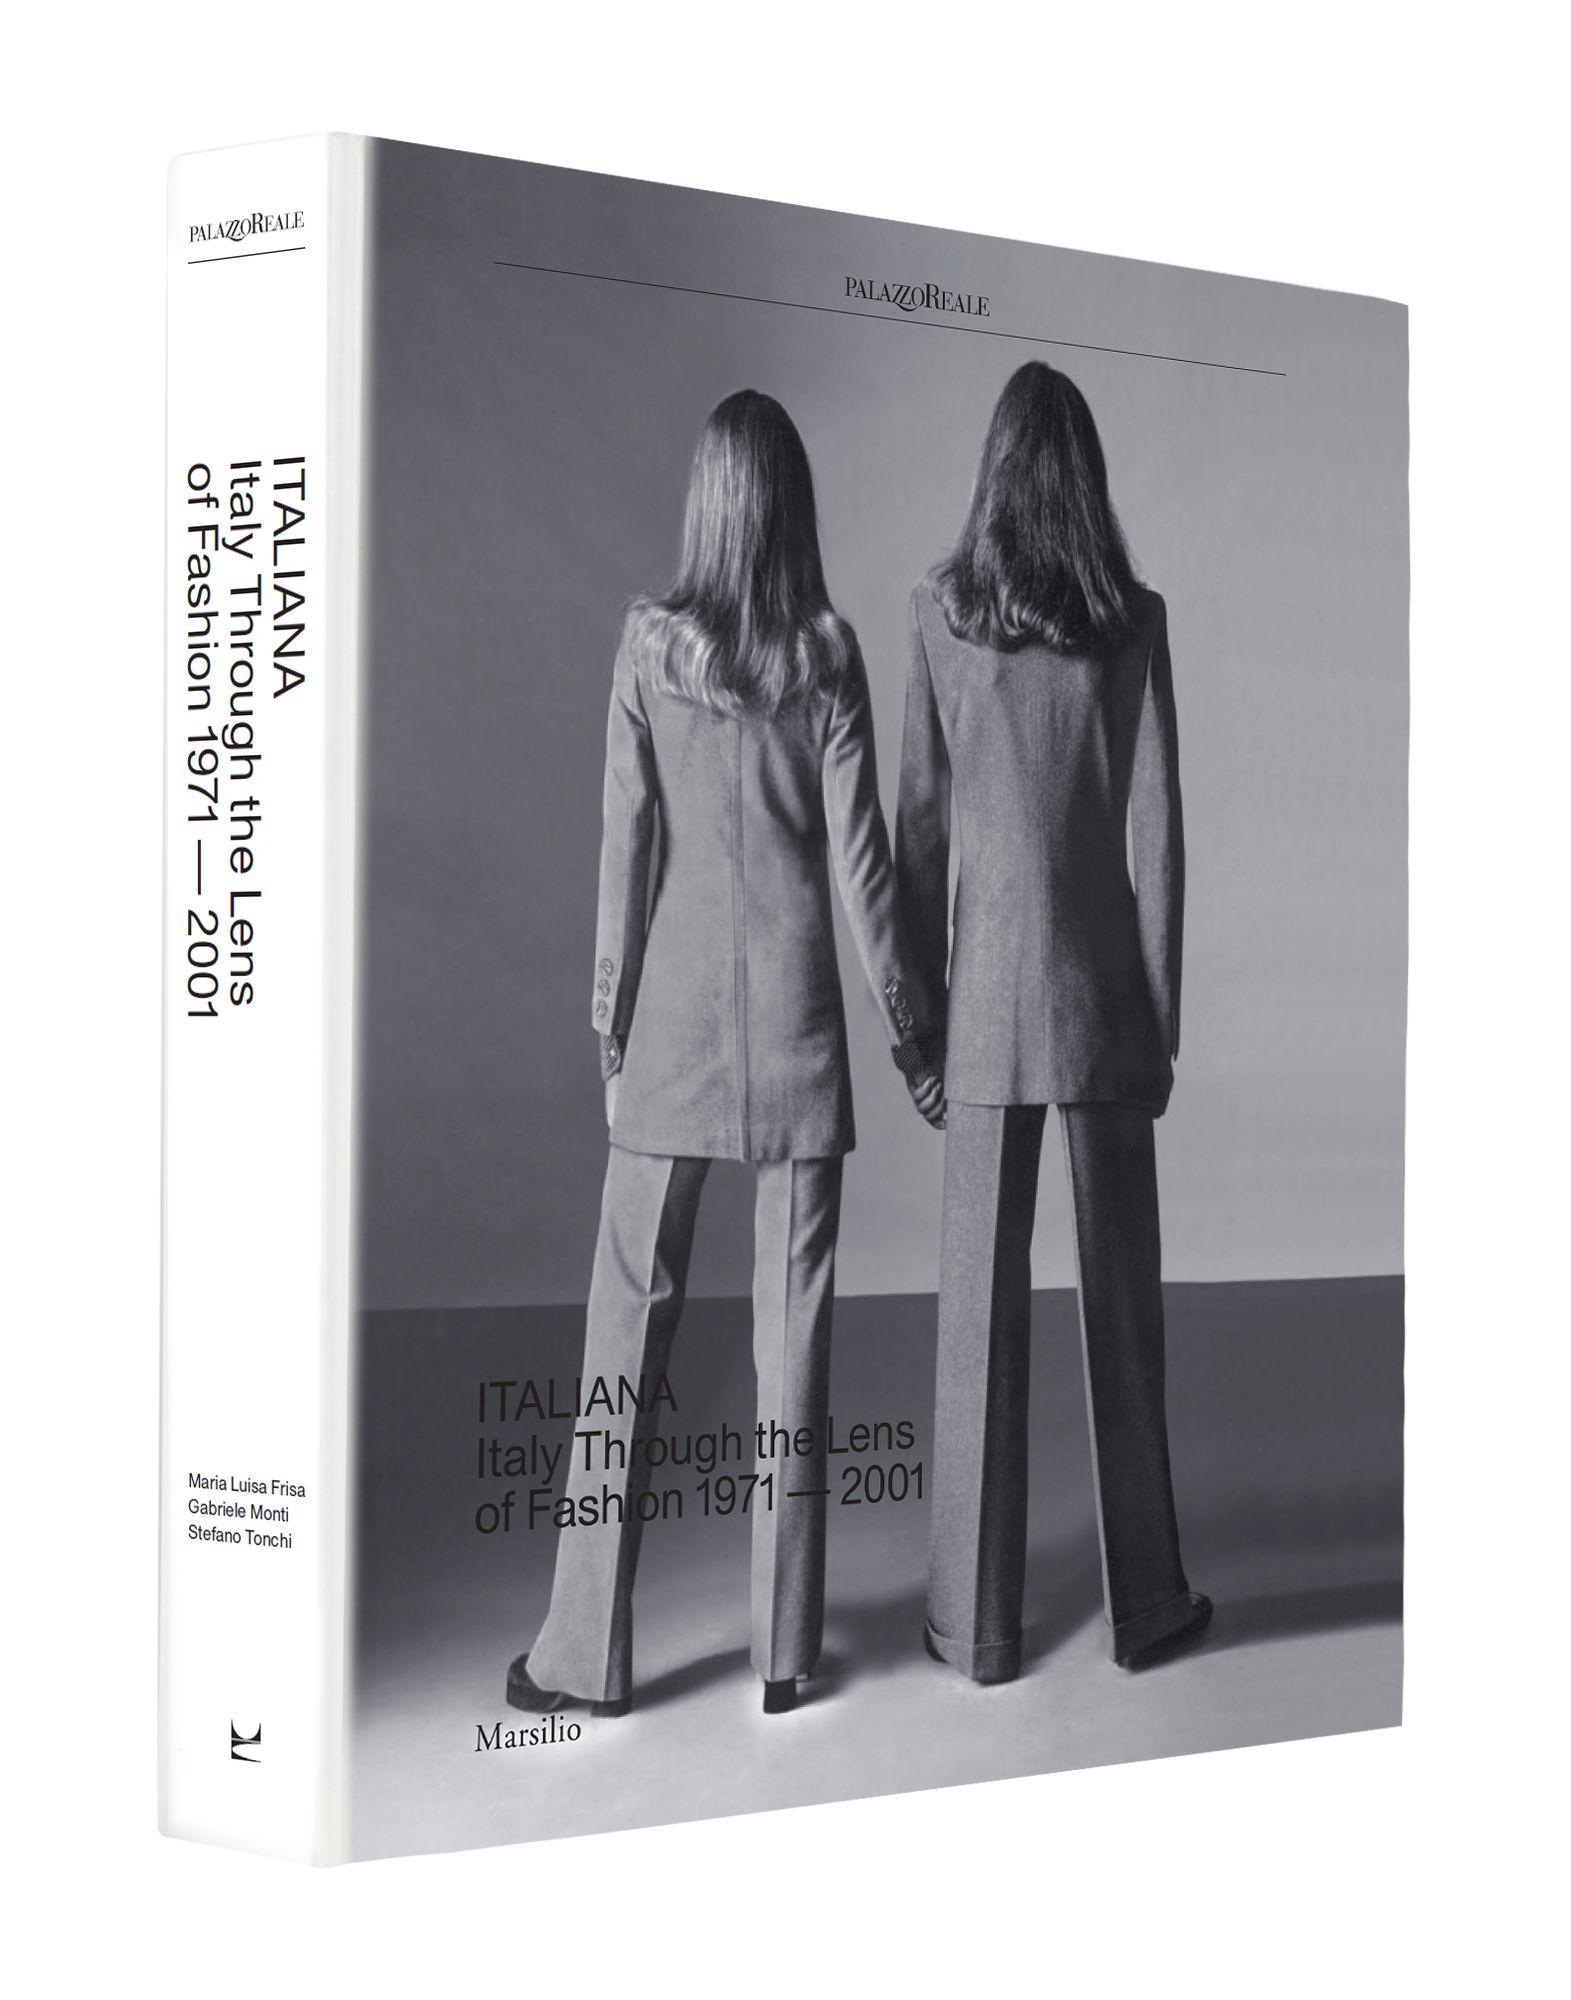 MARSILIO Unisex ファッション Italiana. Italy Through the Lens of Fashion 1971-2001 [-] (-)